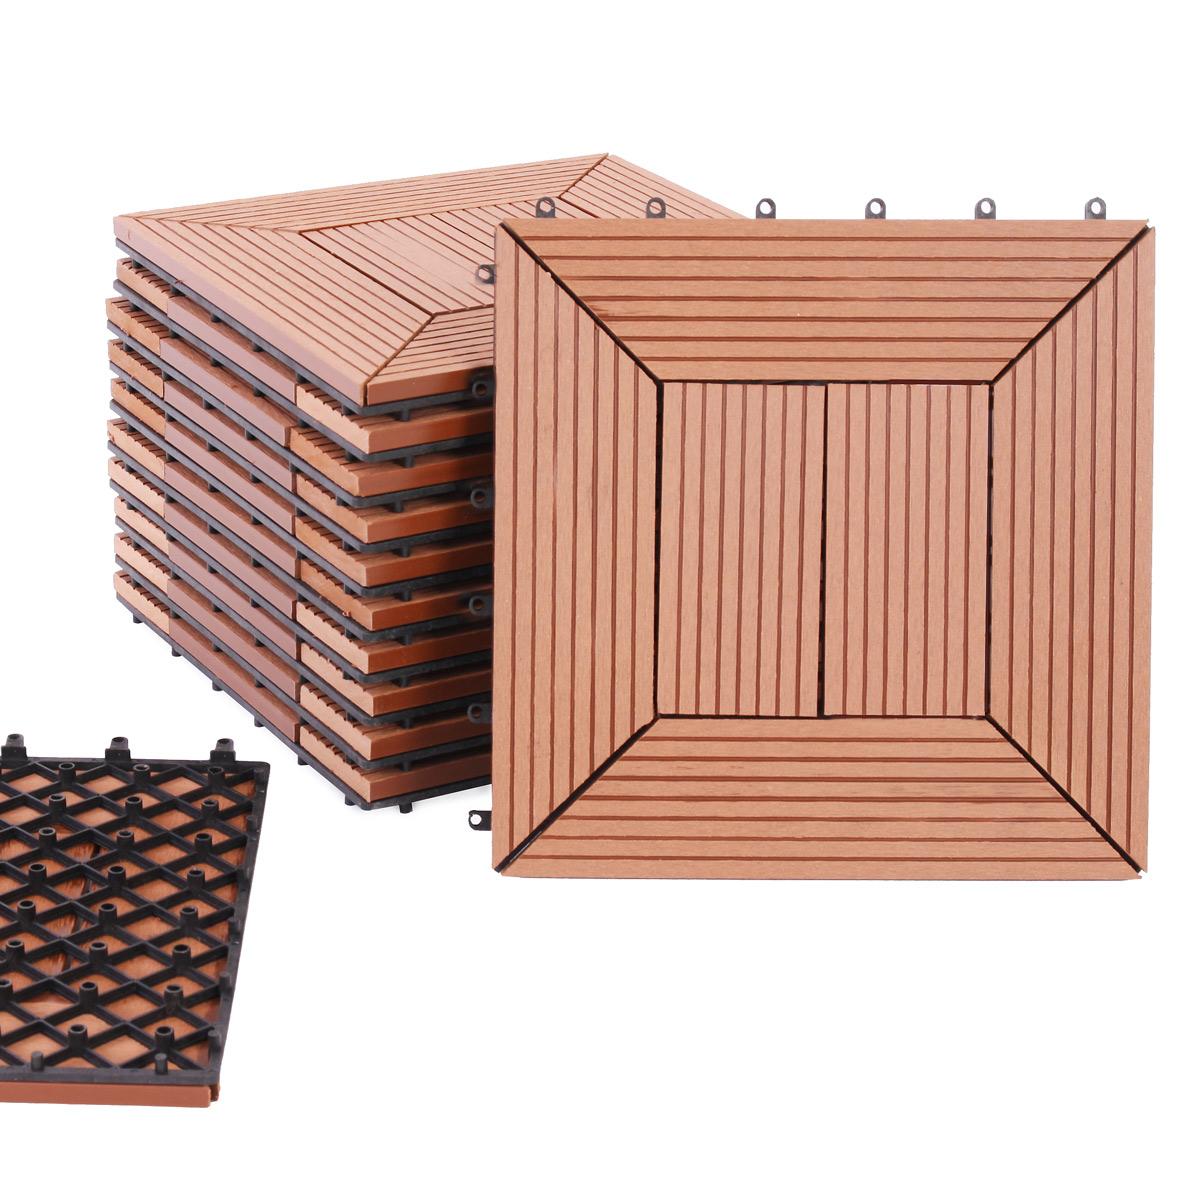 wpc fliesen bodenfliesen bodenbelag 11 holzfliesen 1 m version 3 ebay. Black Bedroom Furniture Sets. Home Design Ideas